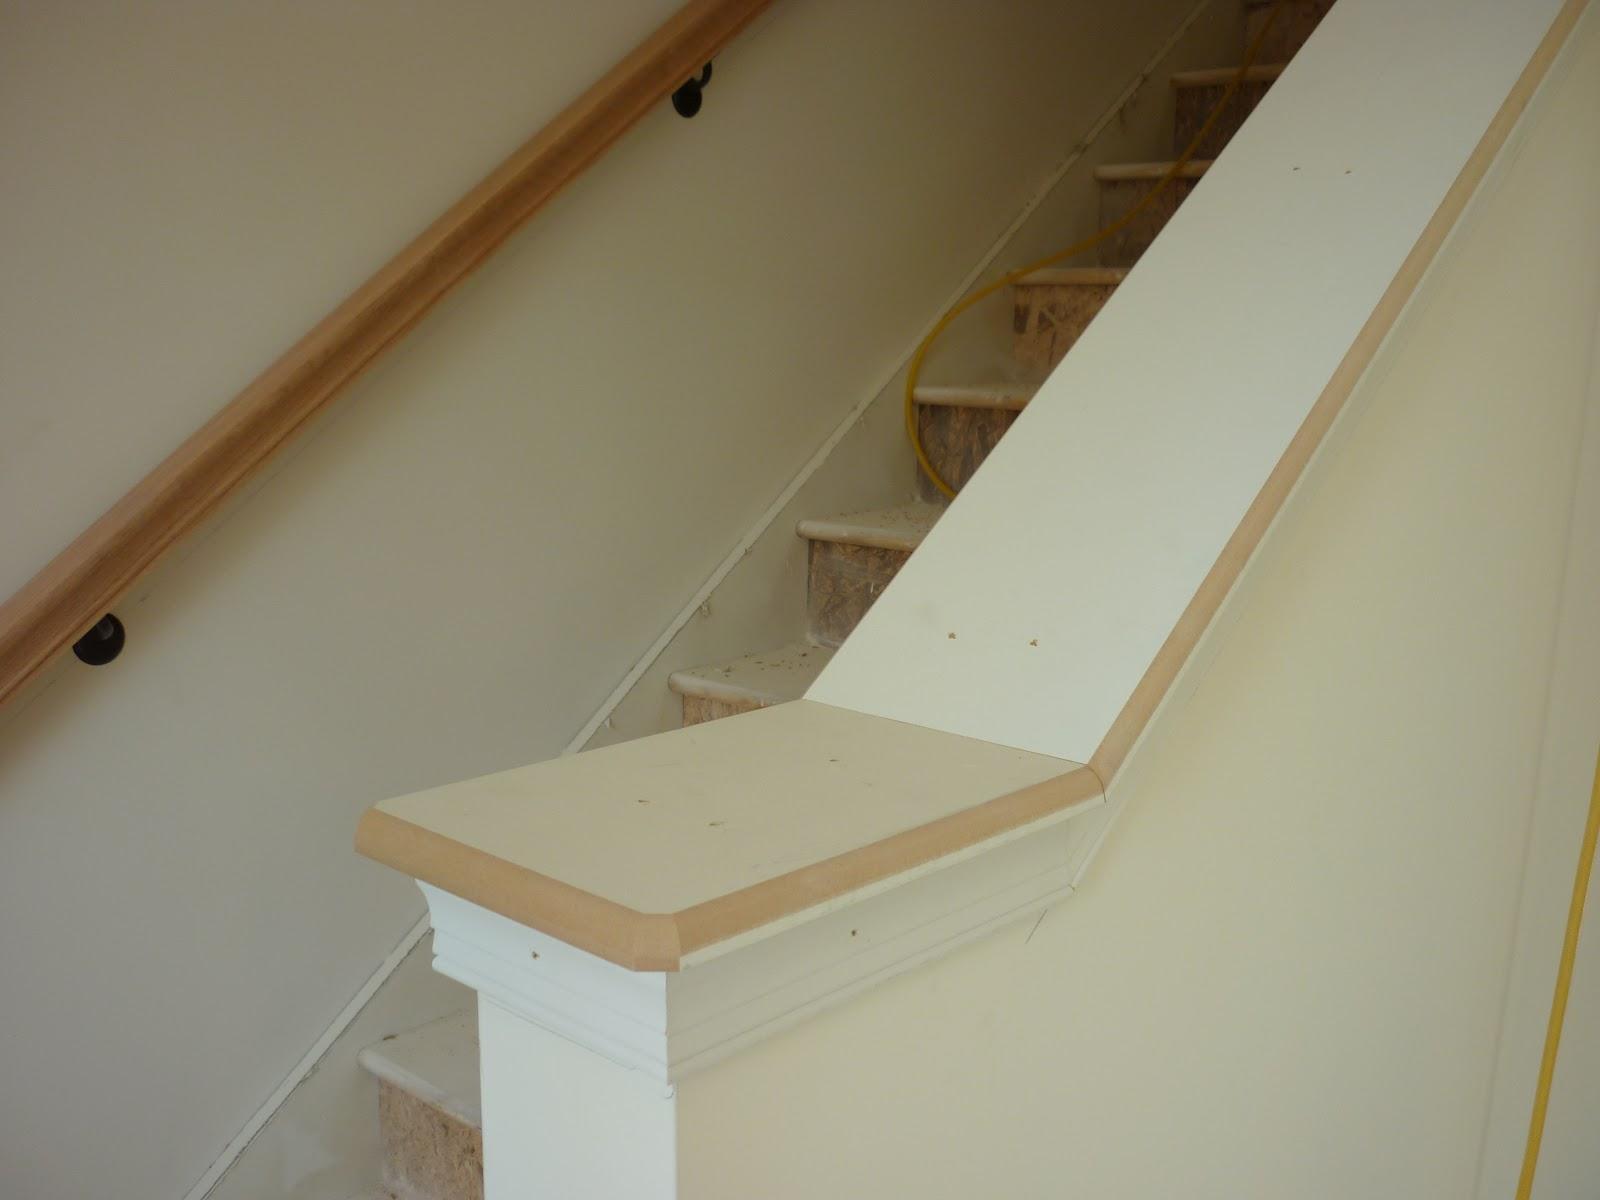 Half Wall Or Hand Rail For Stairs Joy Studio Design